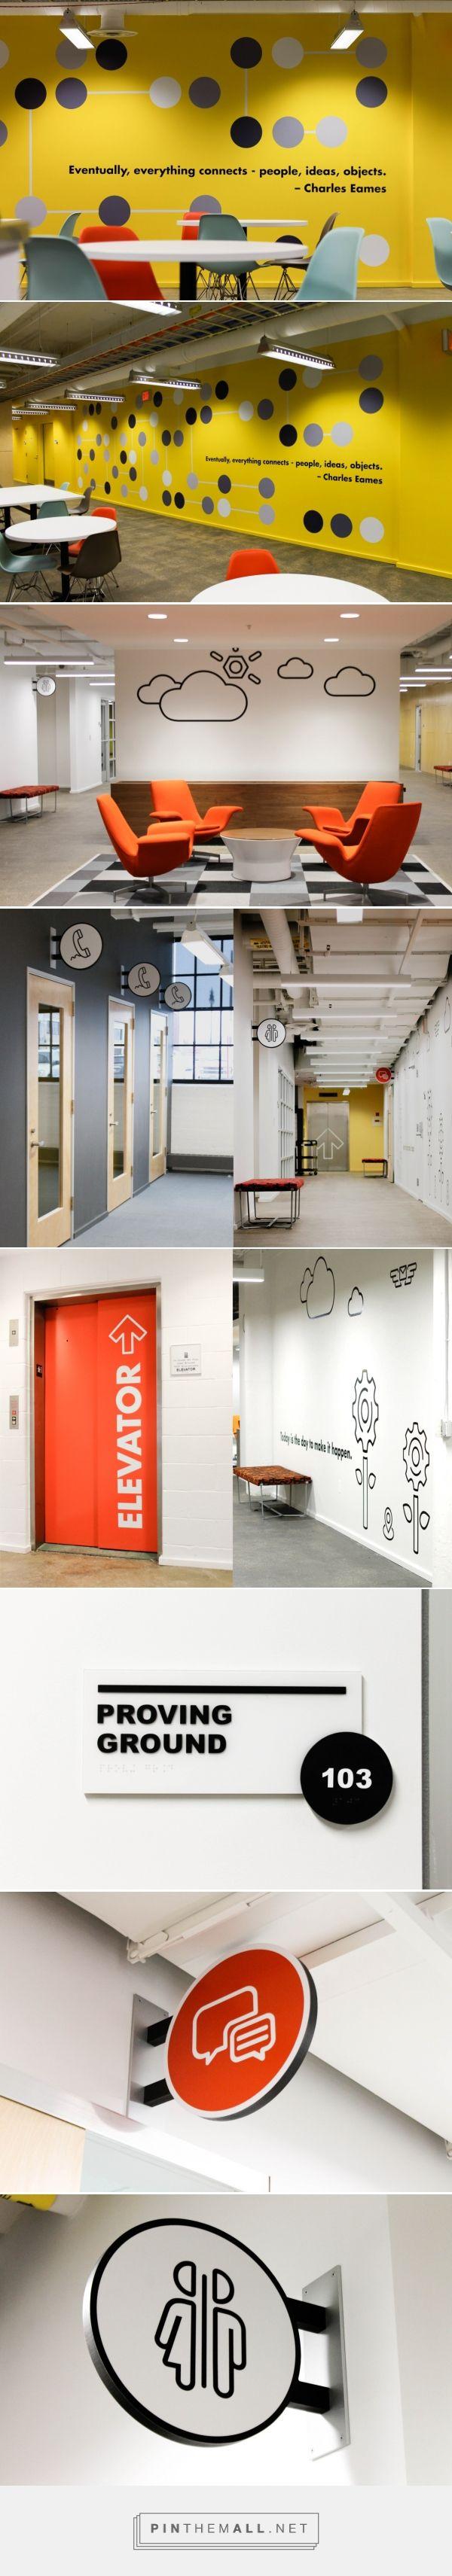 Environmental Design In Collaboration With Interior Designer Patrick Thompson